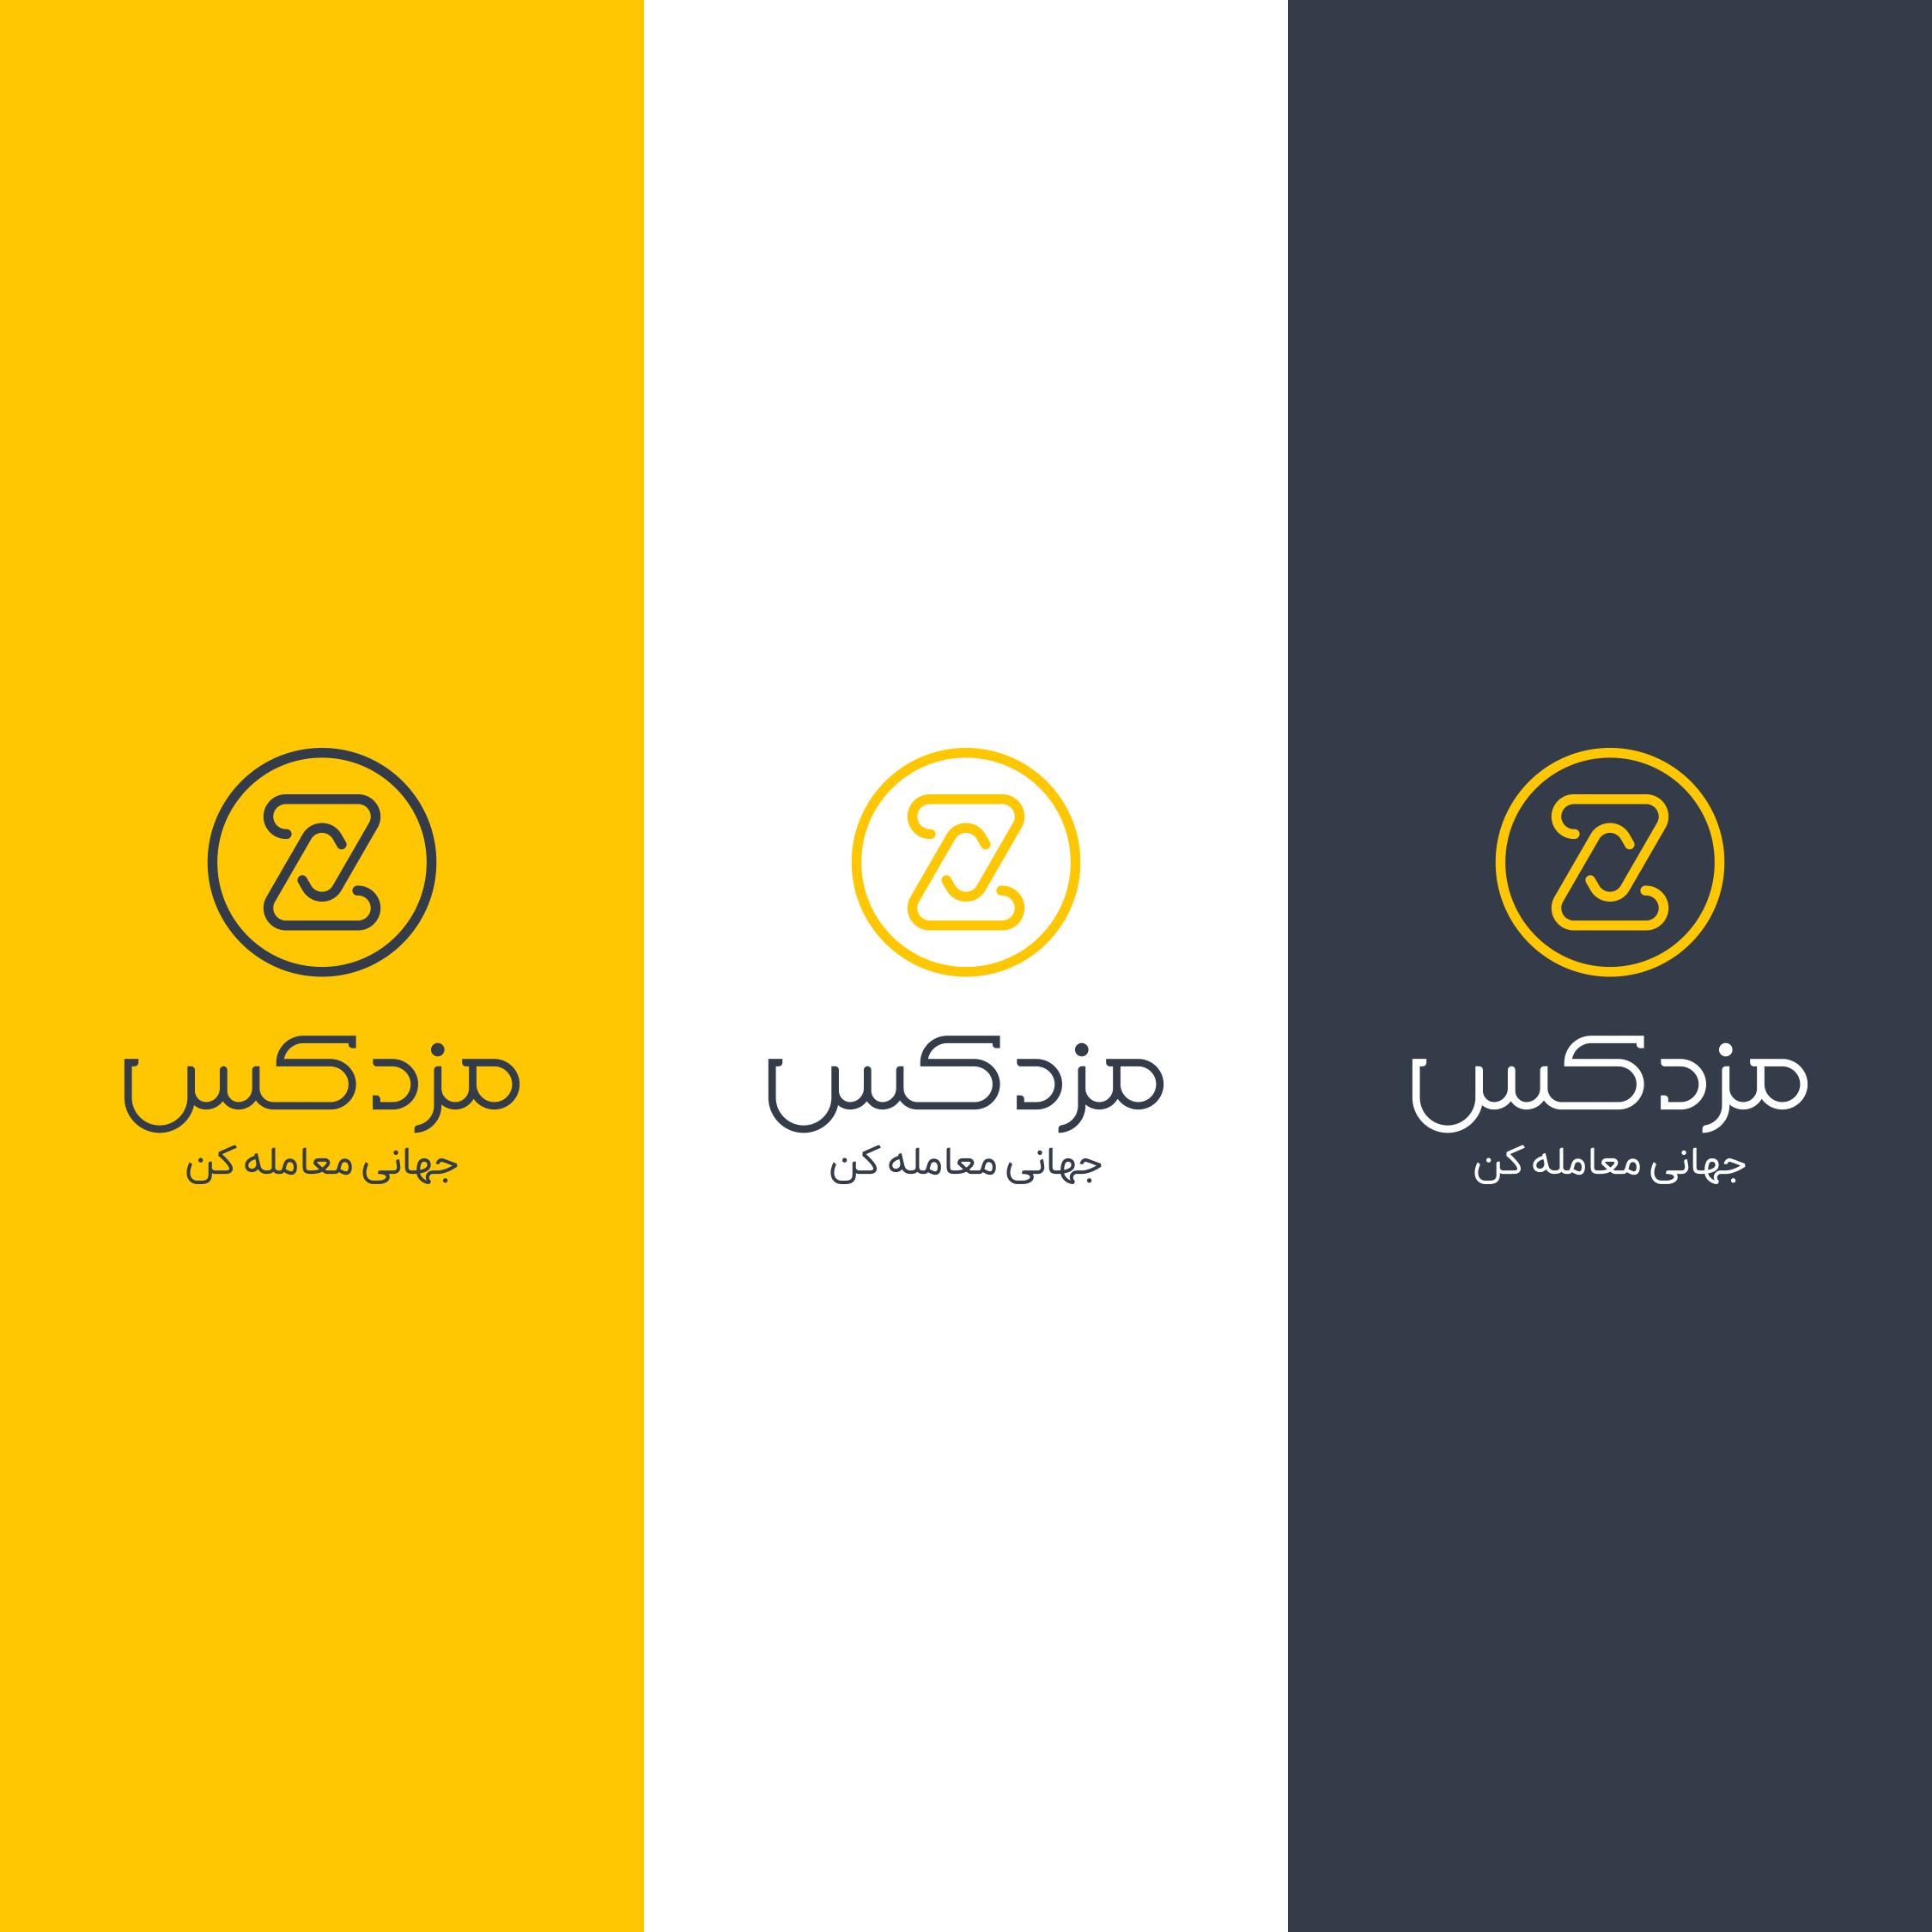 طراحی برند مزدکس آژانس برندسازی ذن mazdax branding be zen branding agency